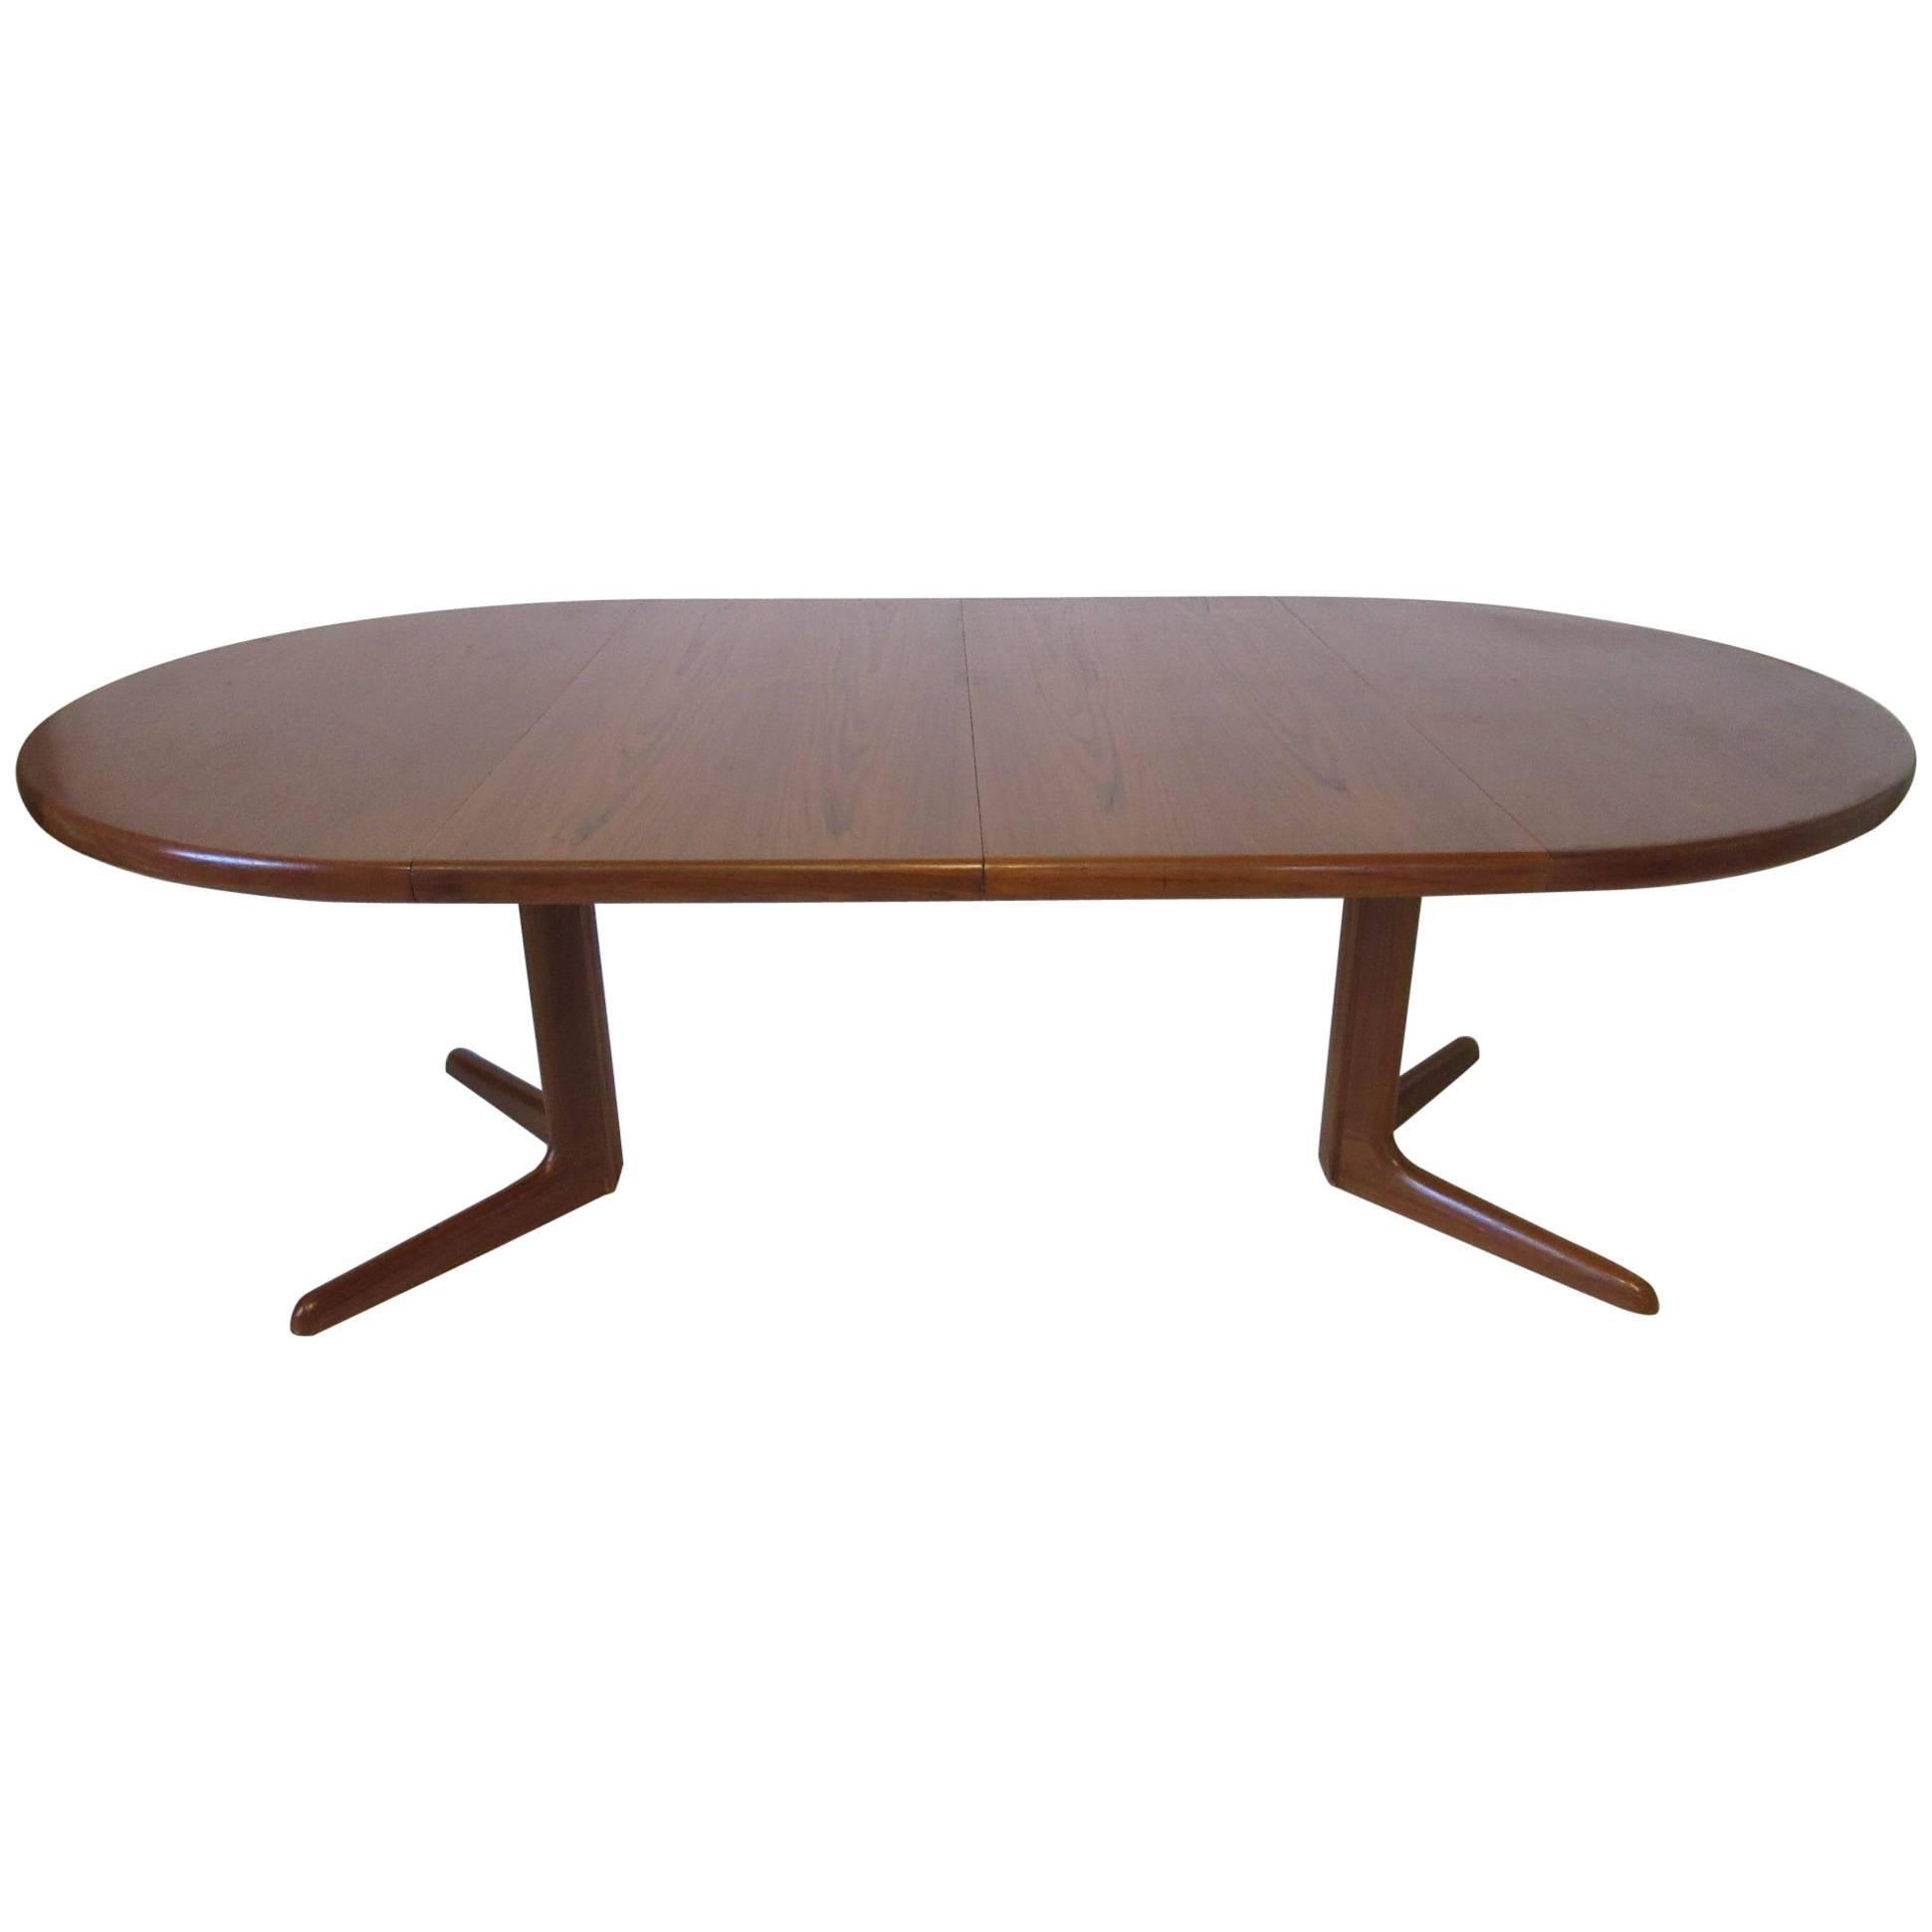 Eric Buck Teak Wood Dining Table Made In Denmark